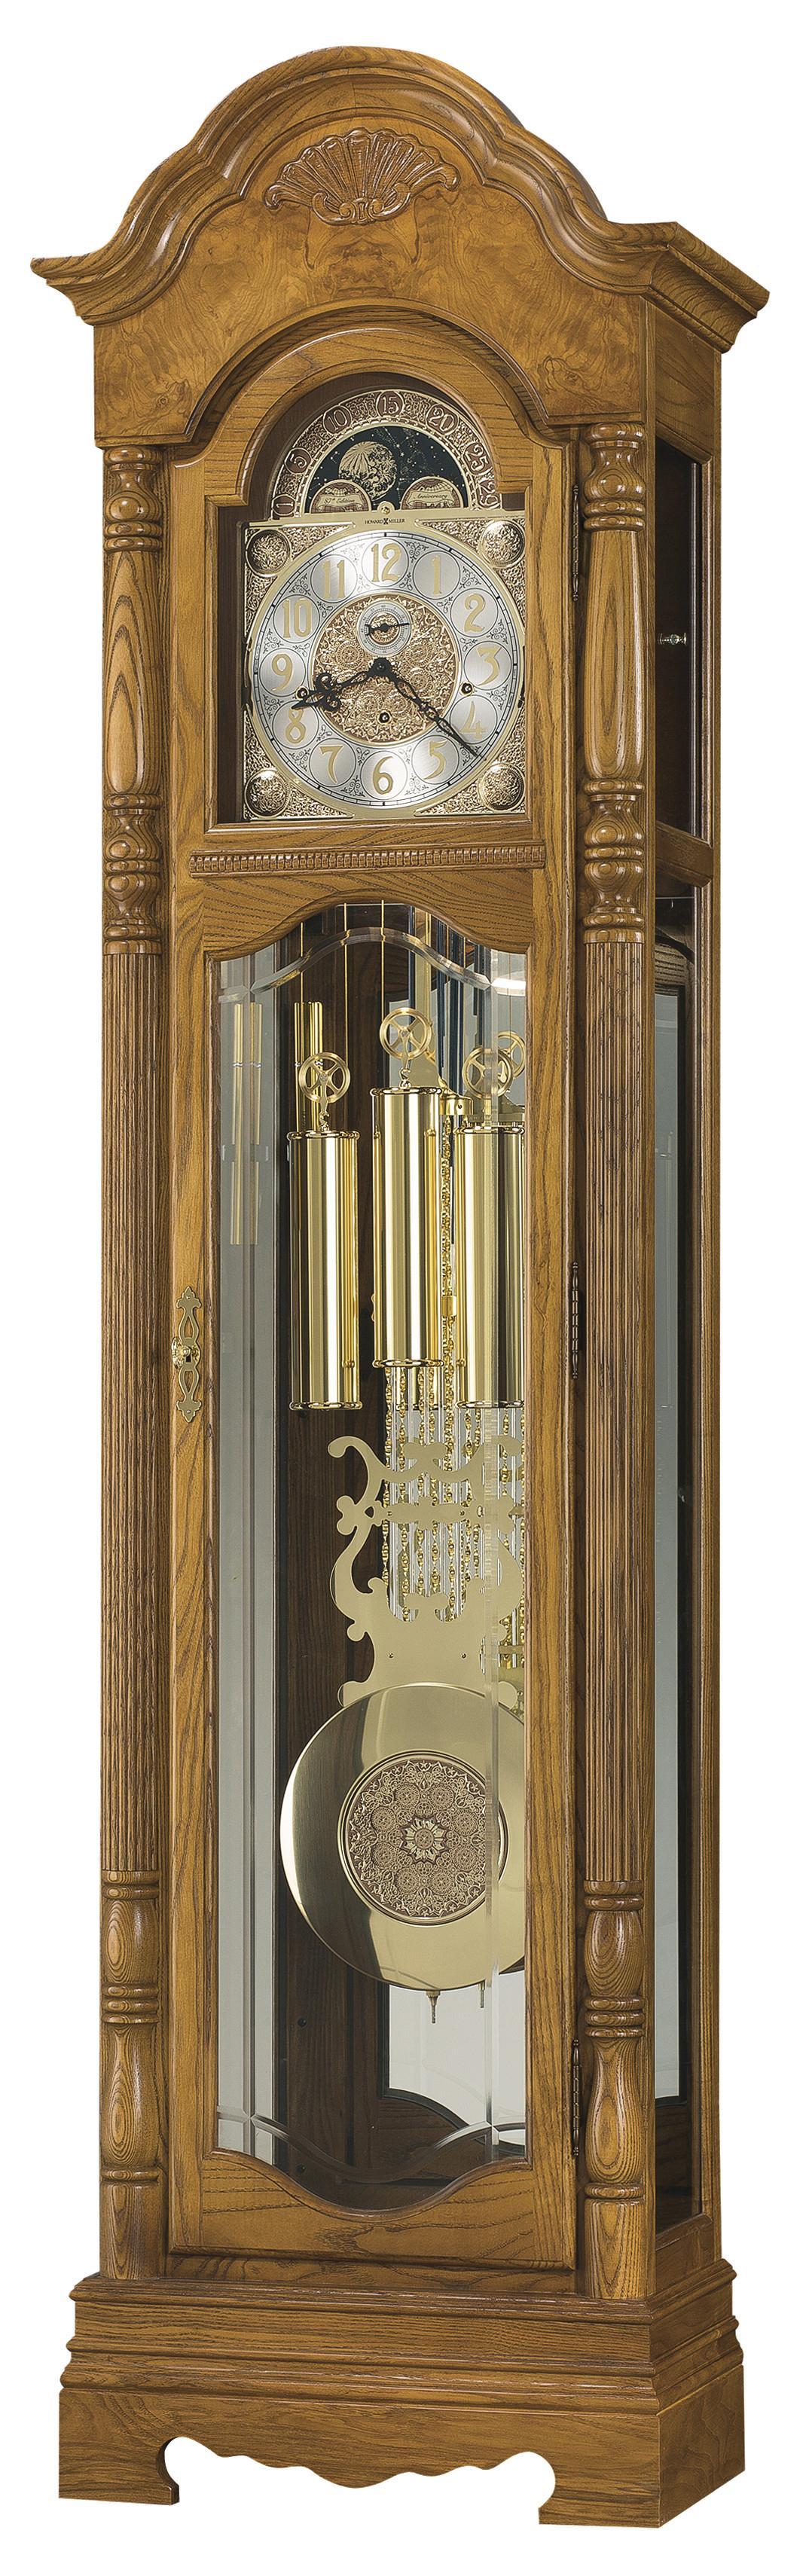 Clocks Browman at Furniture and ApplianceMart